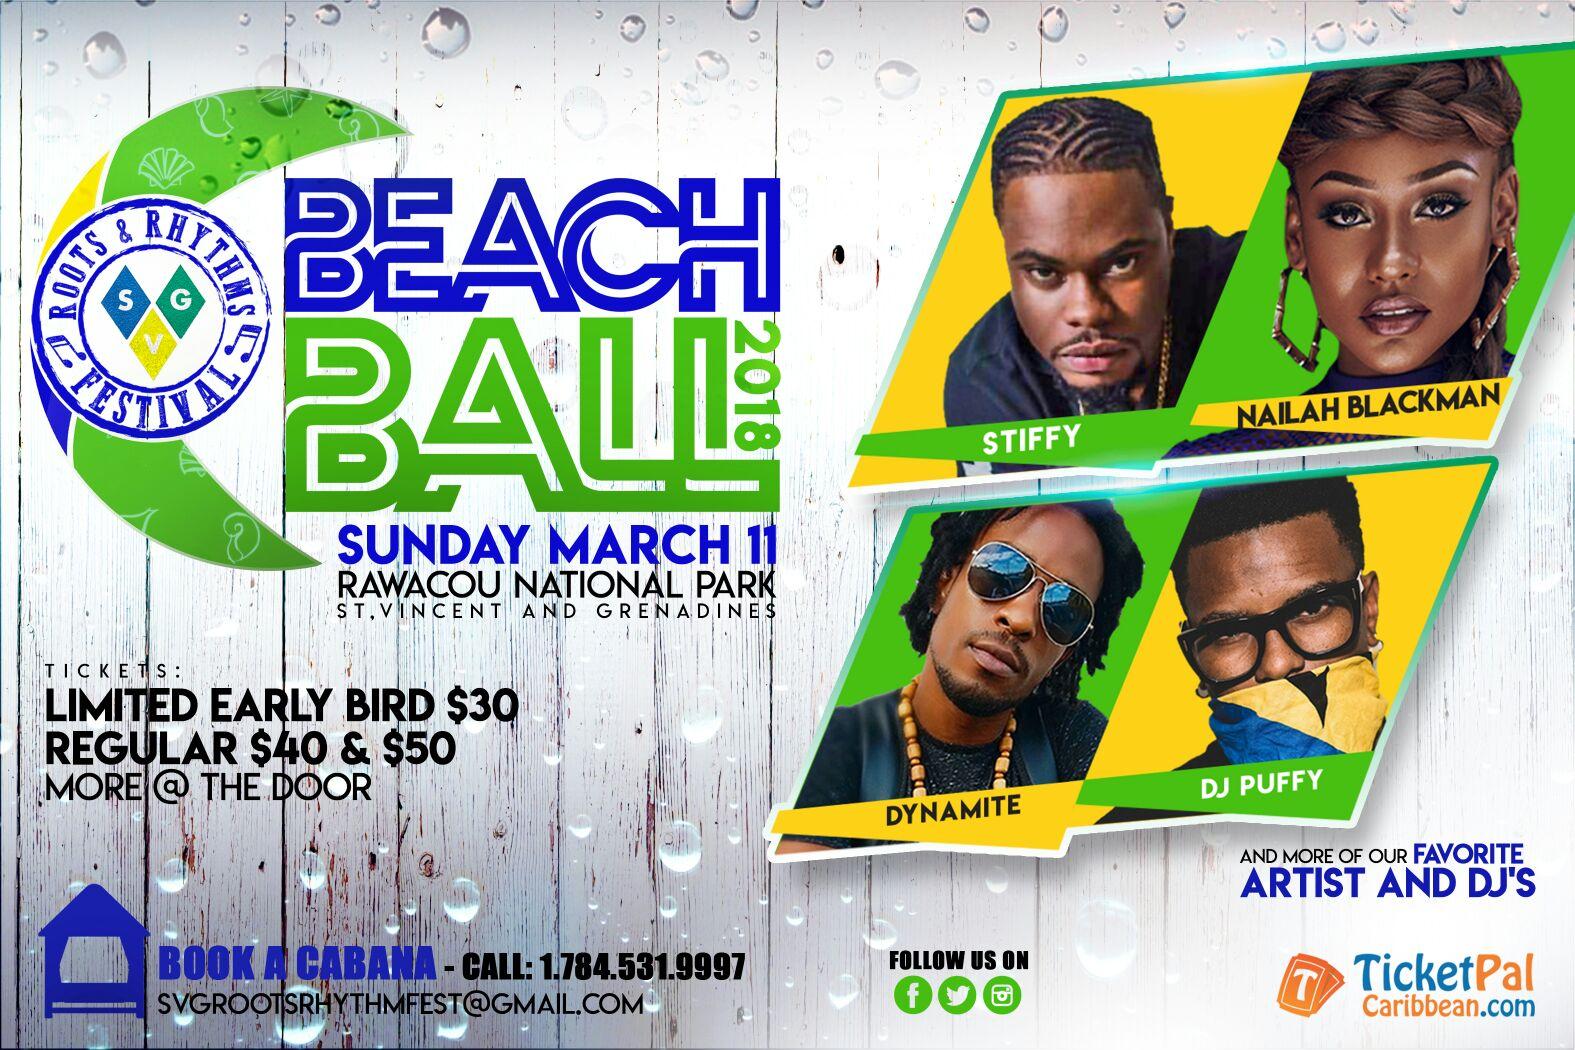 Roots & Rhythms Festival 2018 - Beach Ball